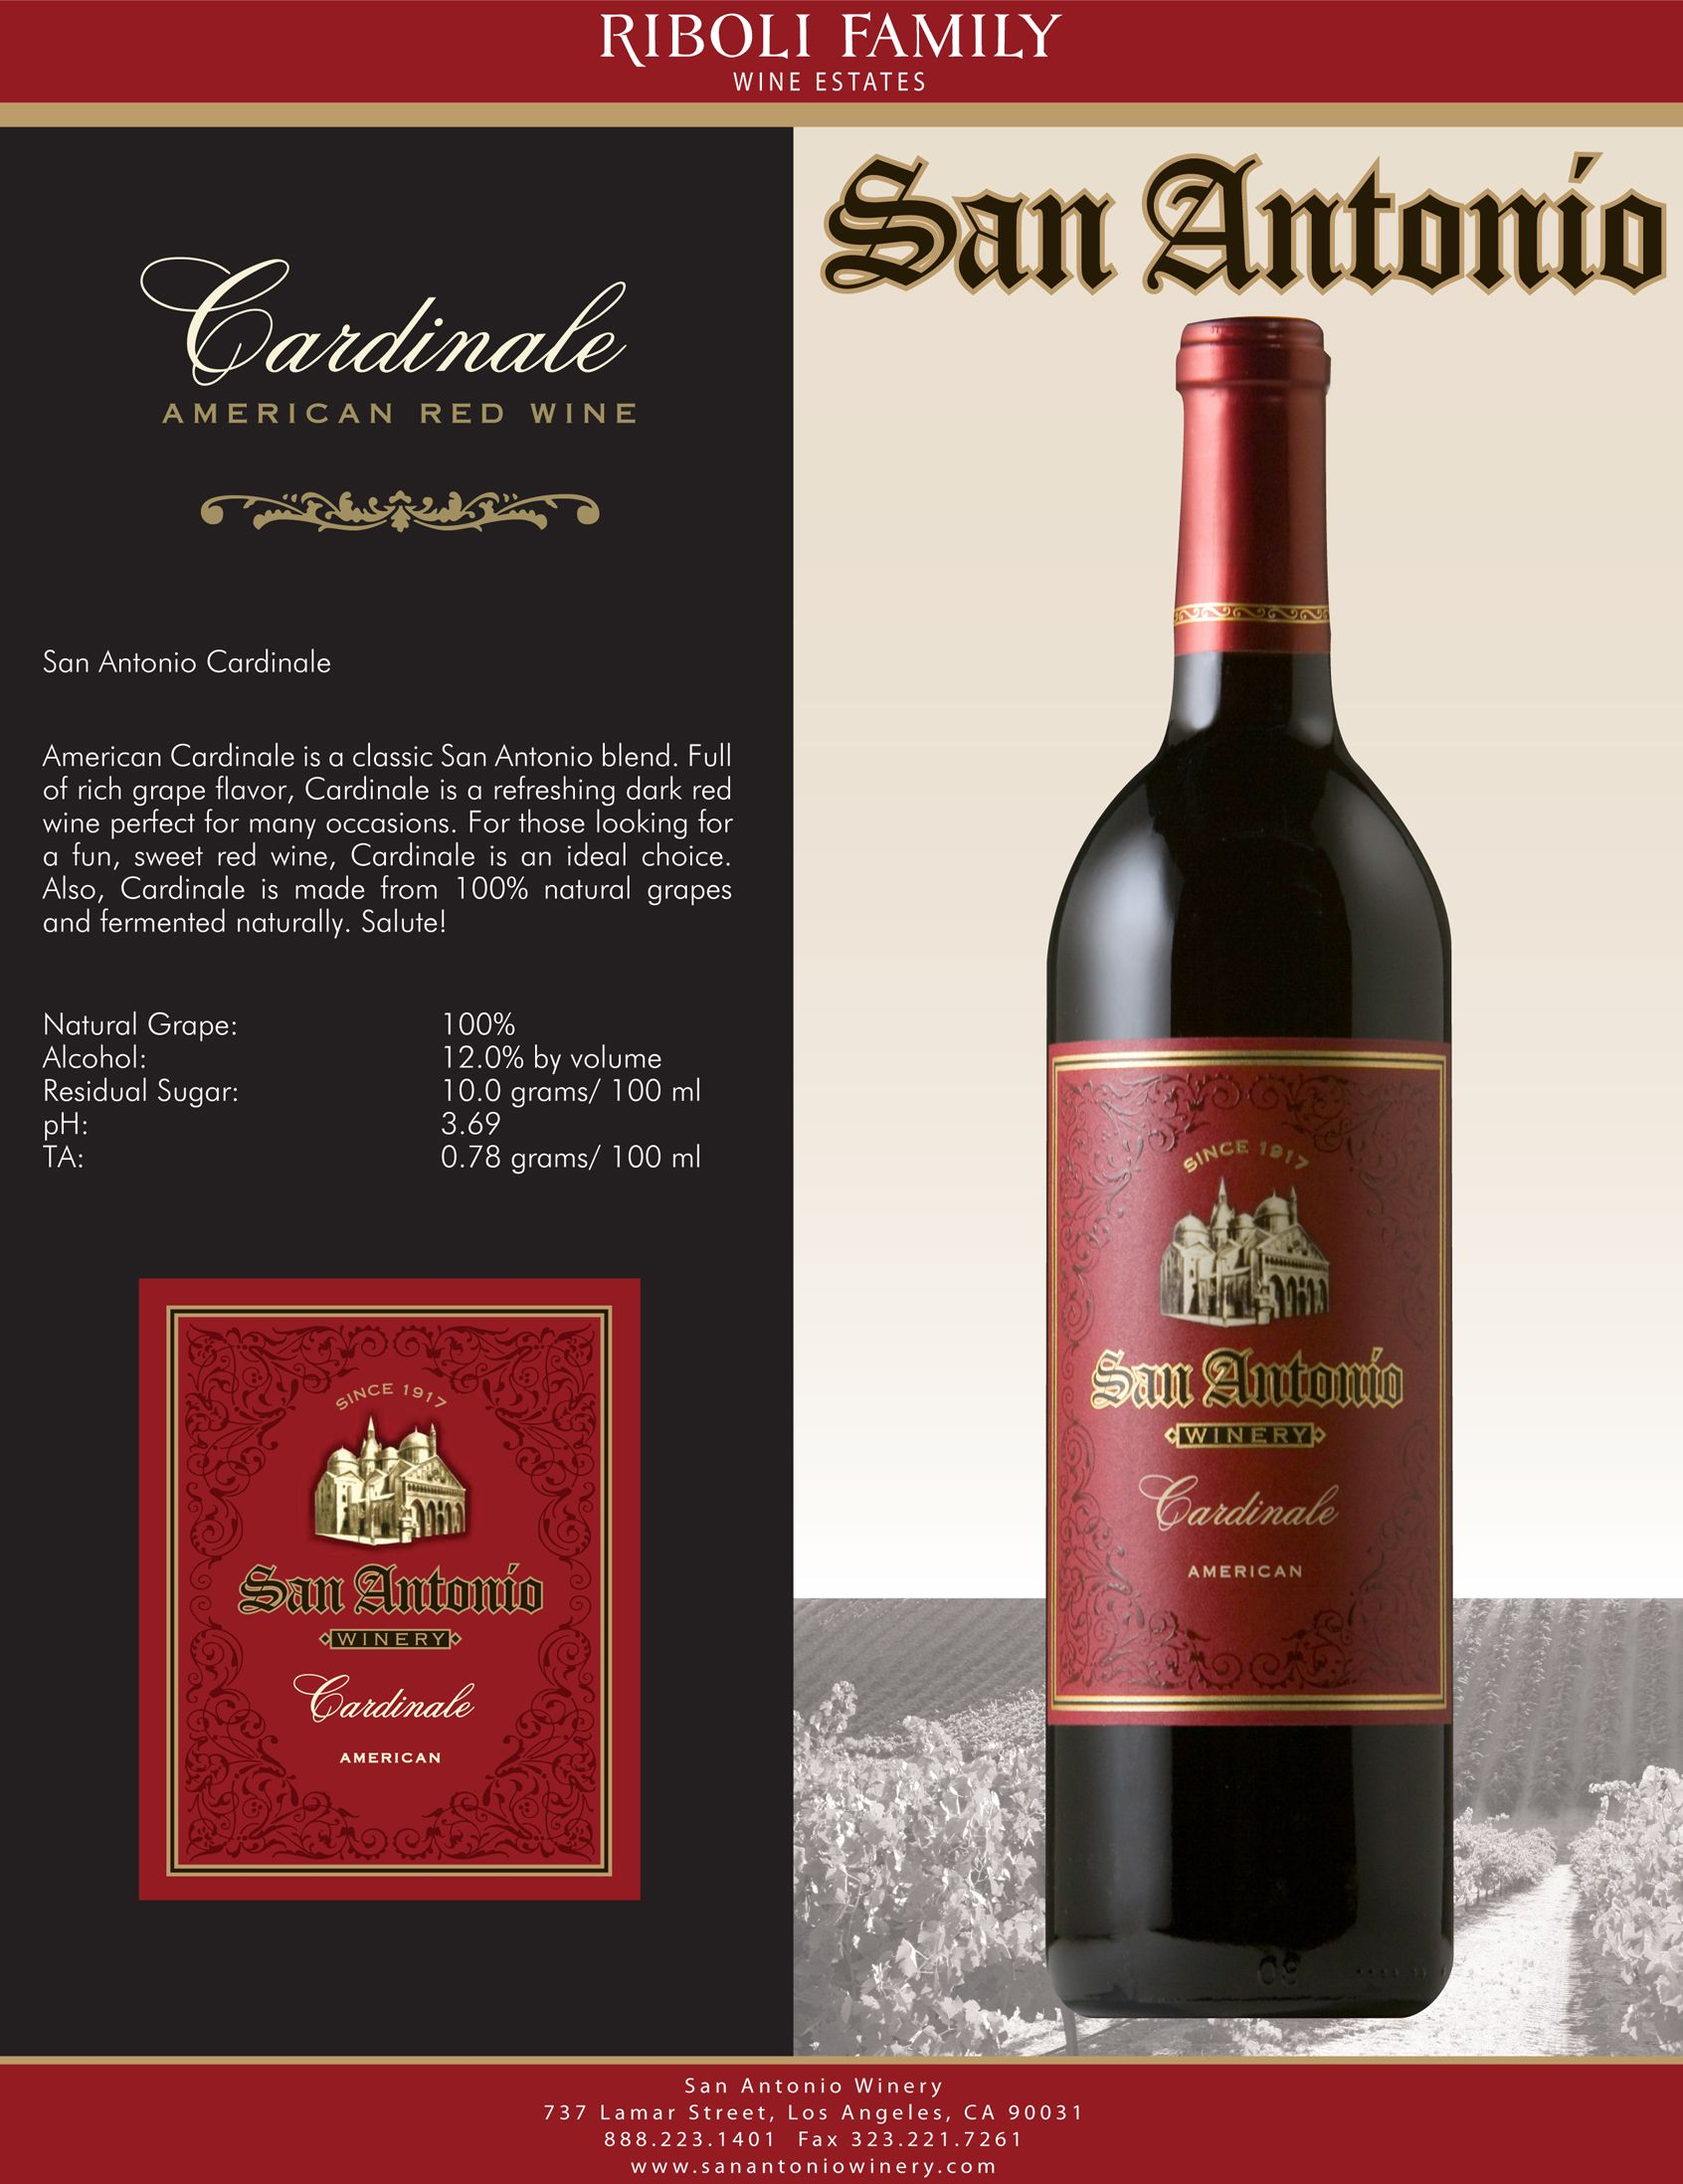 San antonio cardinale american red wine the sweetest red for Wine painting san antonio